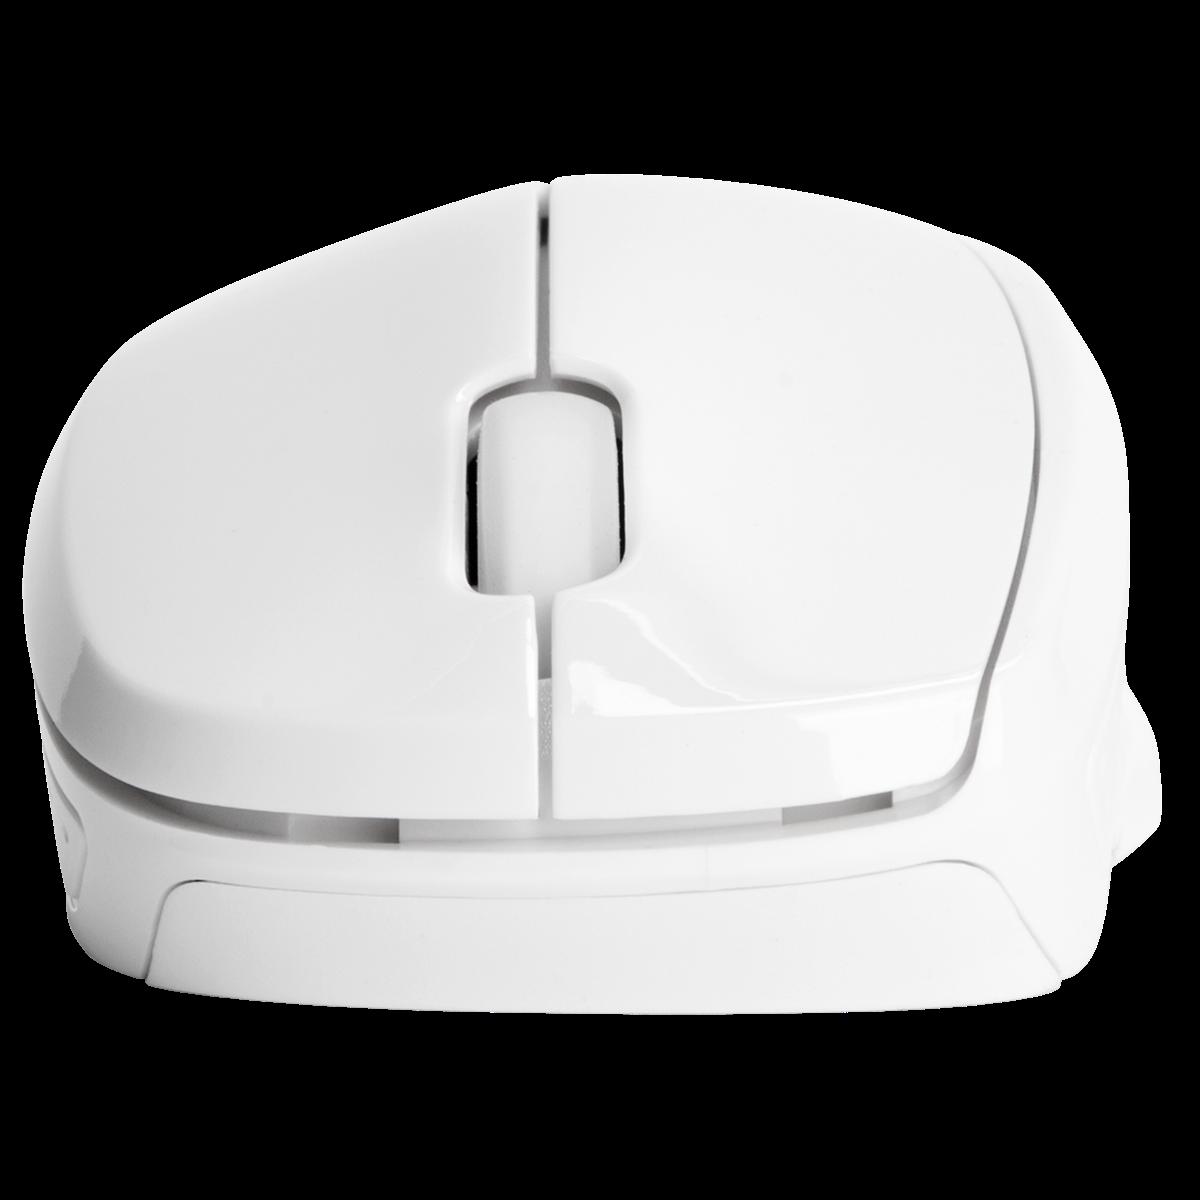 Targus W571 Wireless Optical Mouse 1600 Dpi Amw571ap Hitam Daftar Toshiba U55 Fs White 0027800